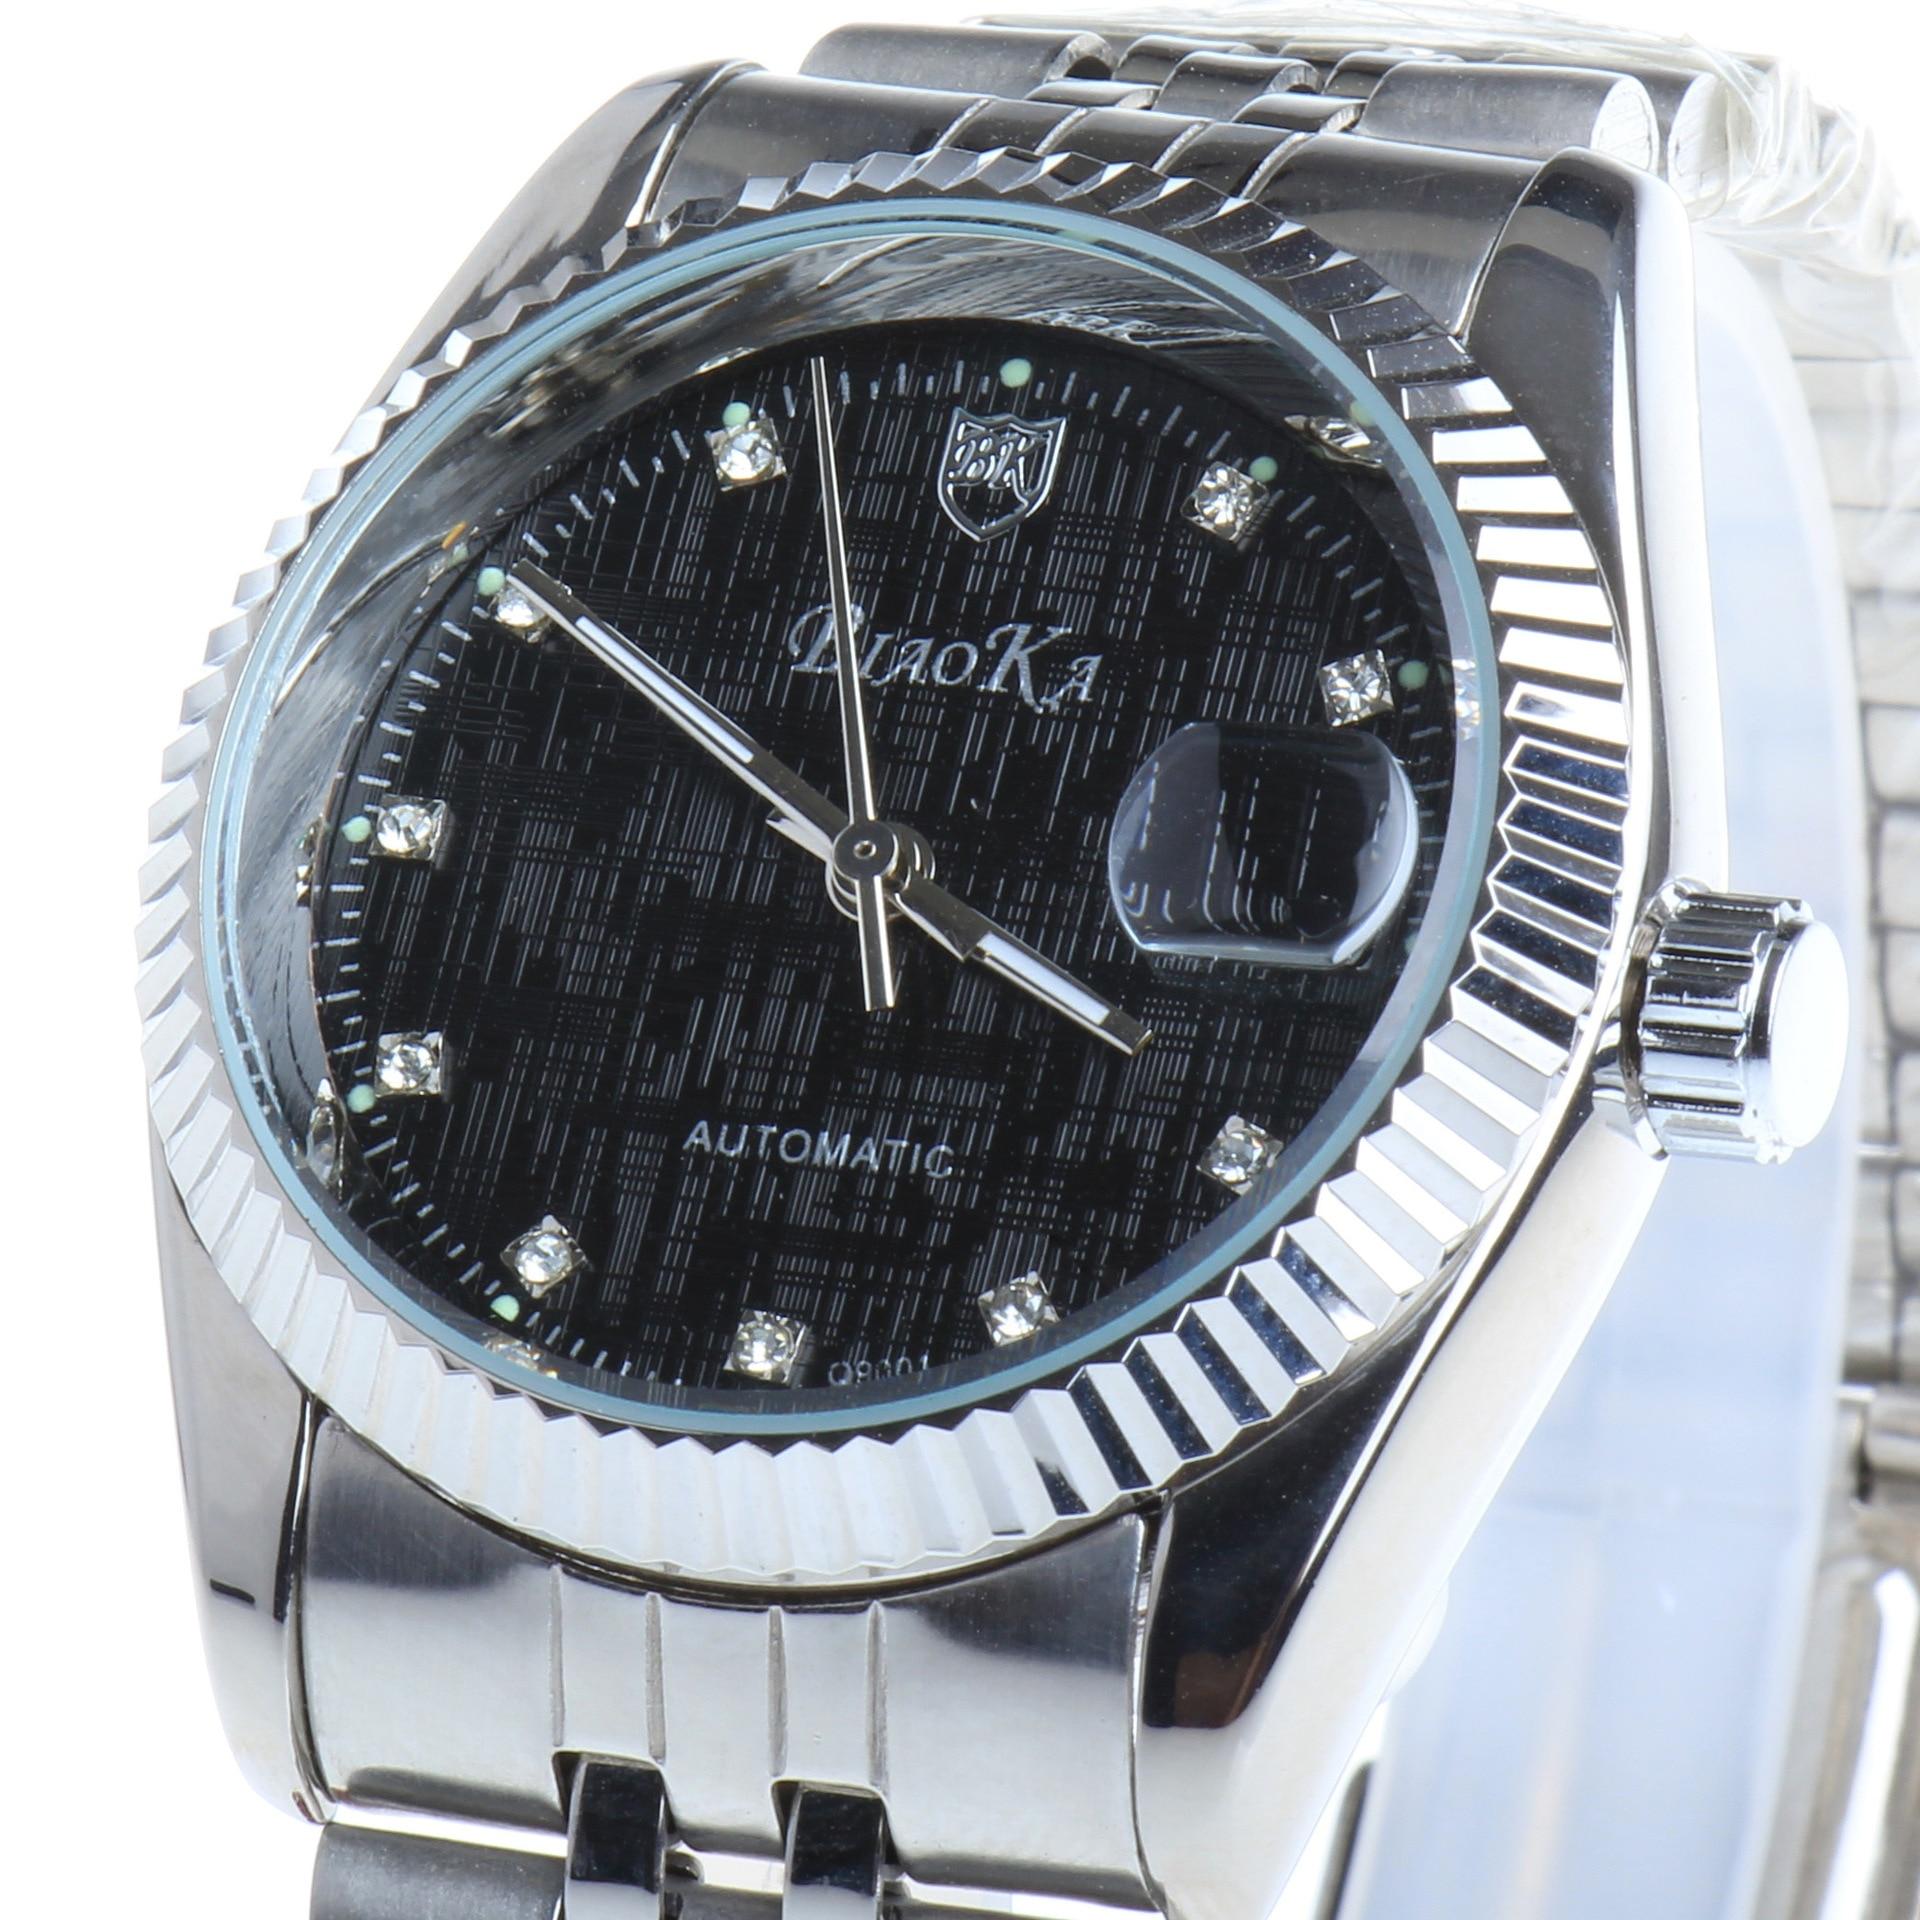 BIAOKA Watches Classic Mens AUTO Date automatic Mechanical Watch Self Winding Analog Skeleton Black steel strip